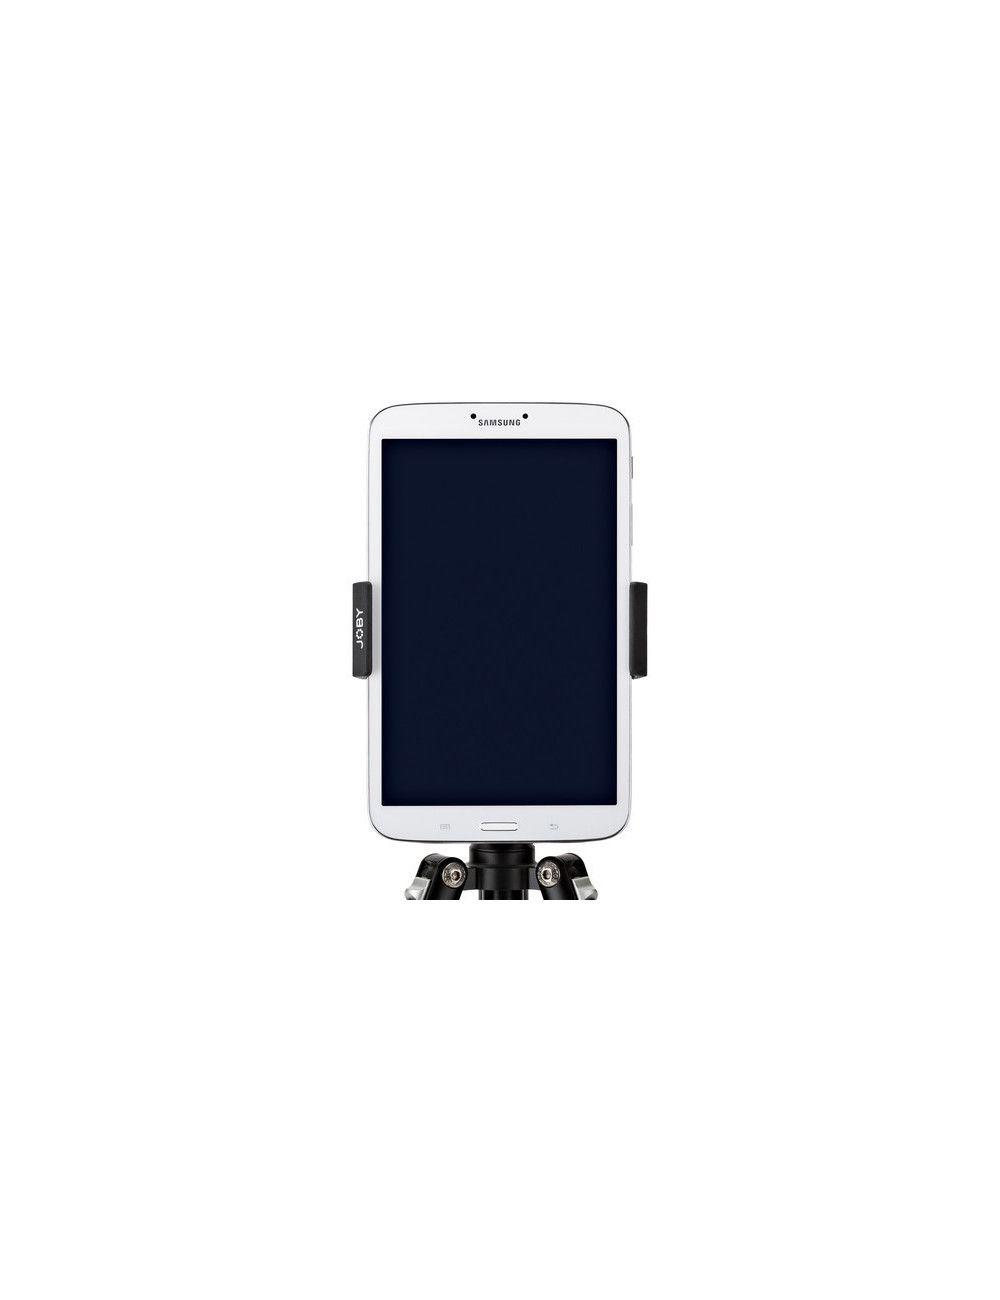 Lampara de Led  YN-900 BICOLOR Controlable con Celular